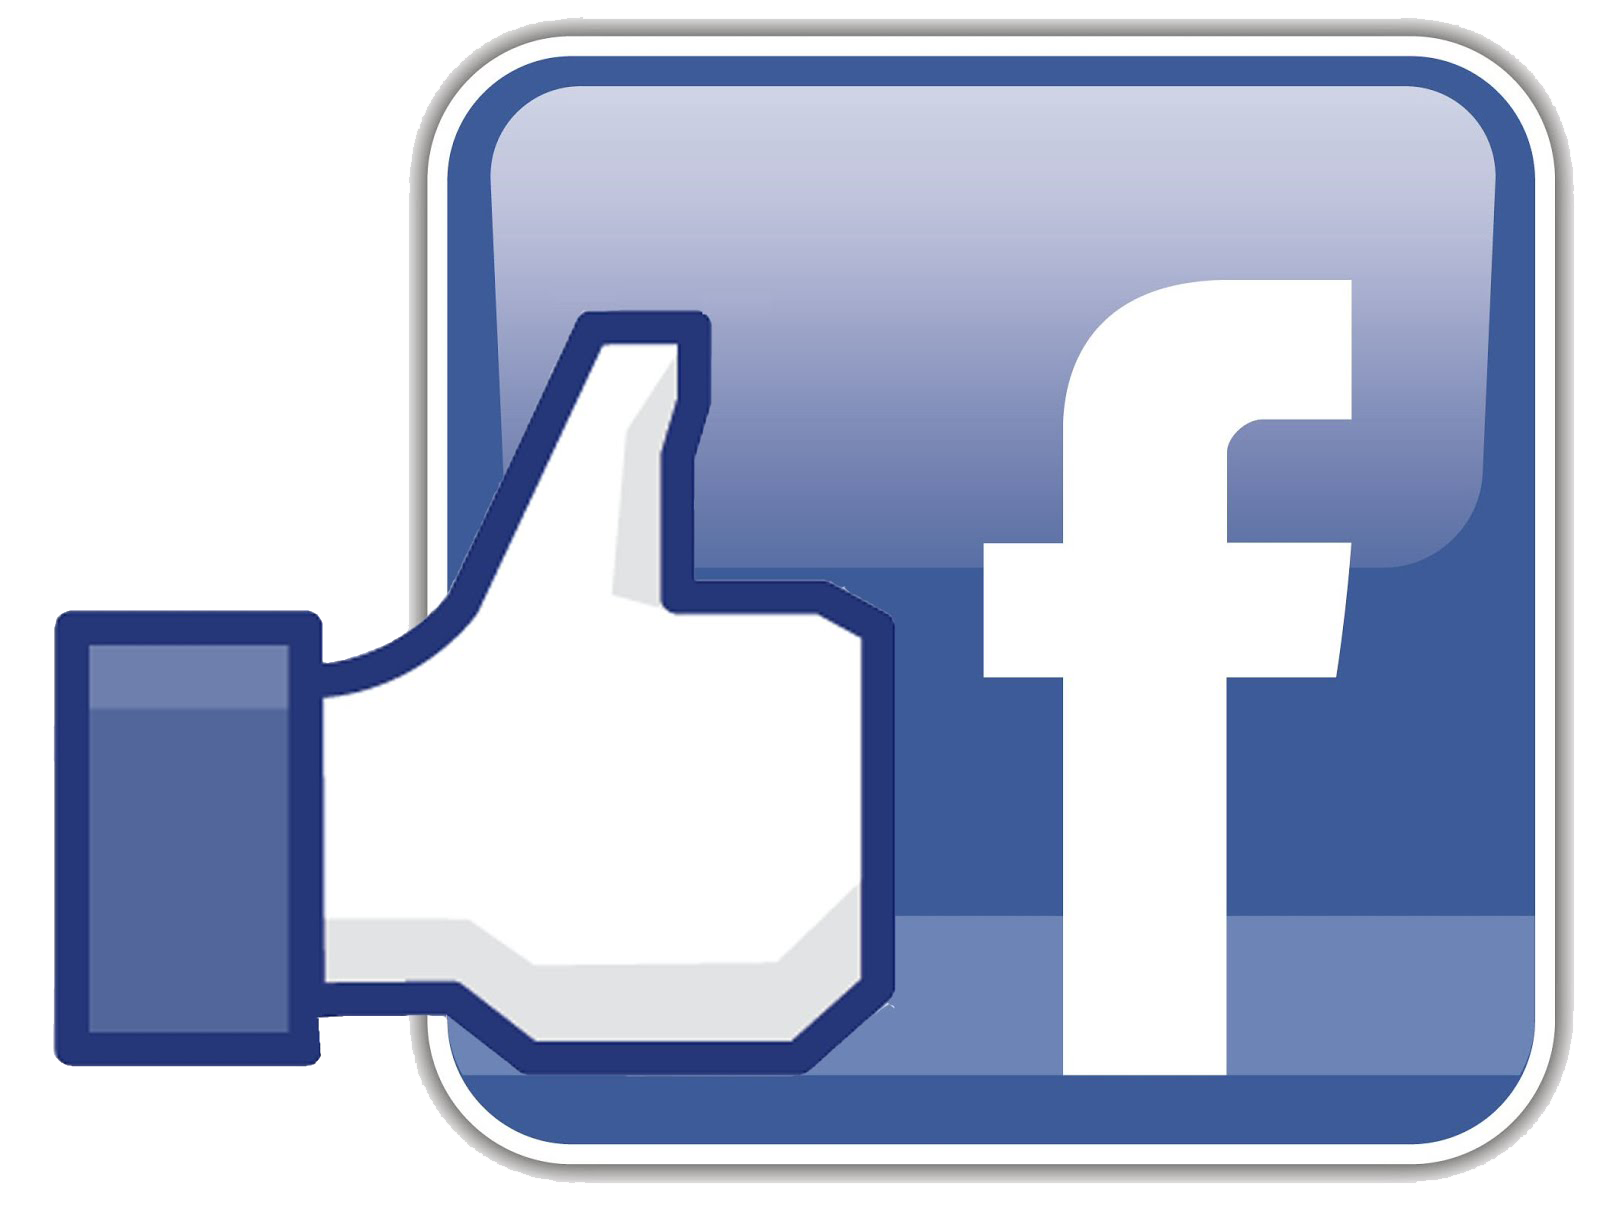 381/facebook-logo-png-38357[1].png